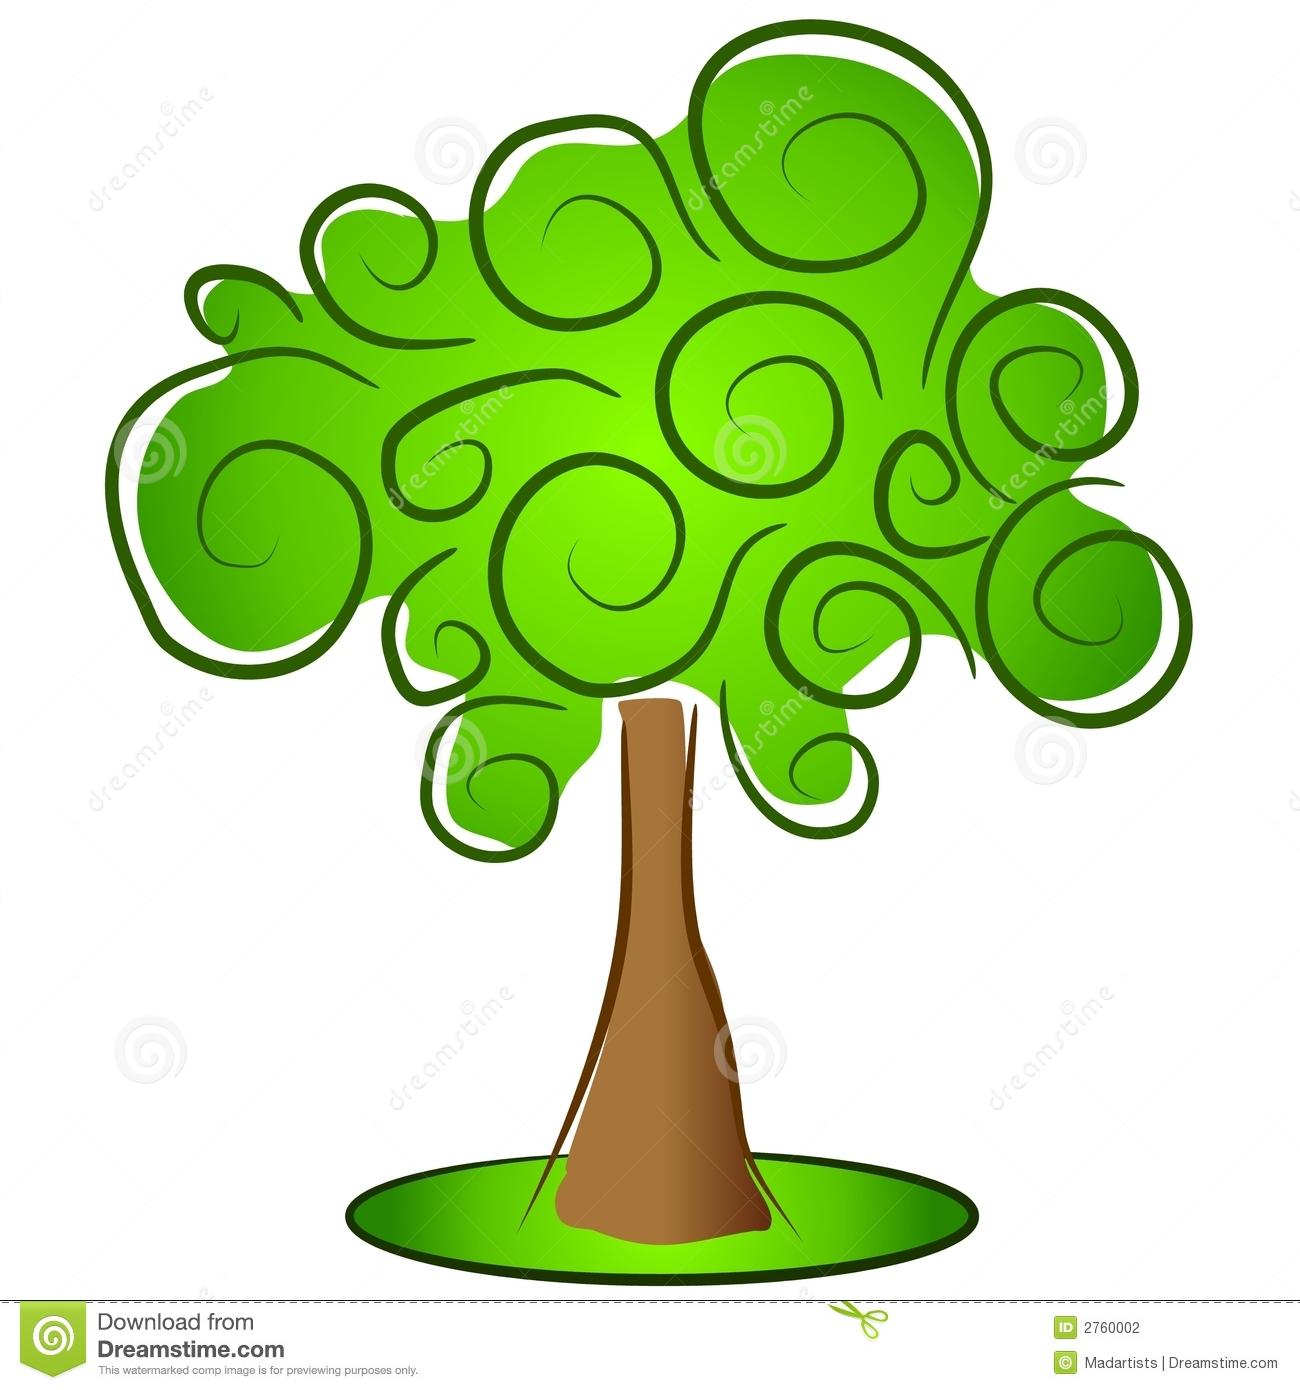 Free clipartfest treeclipart. Baum clipart kostenlos